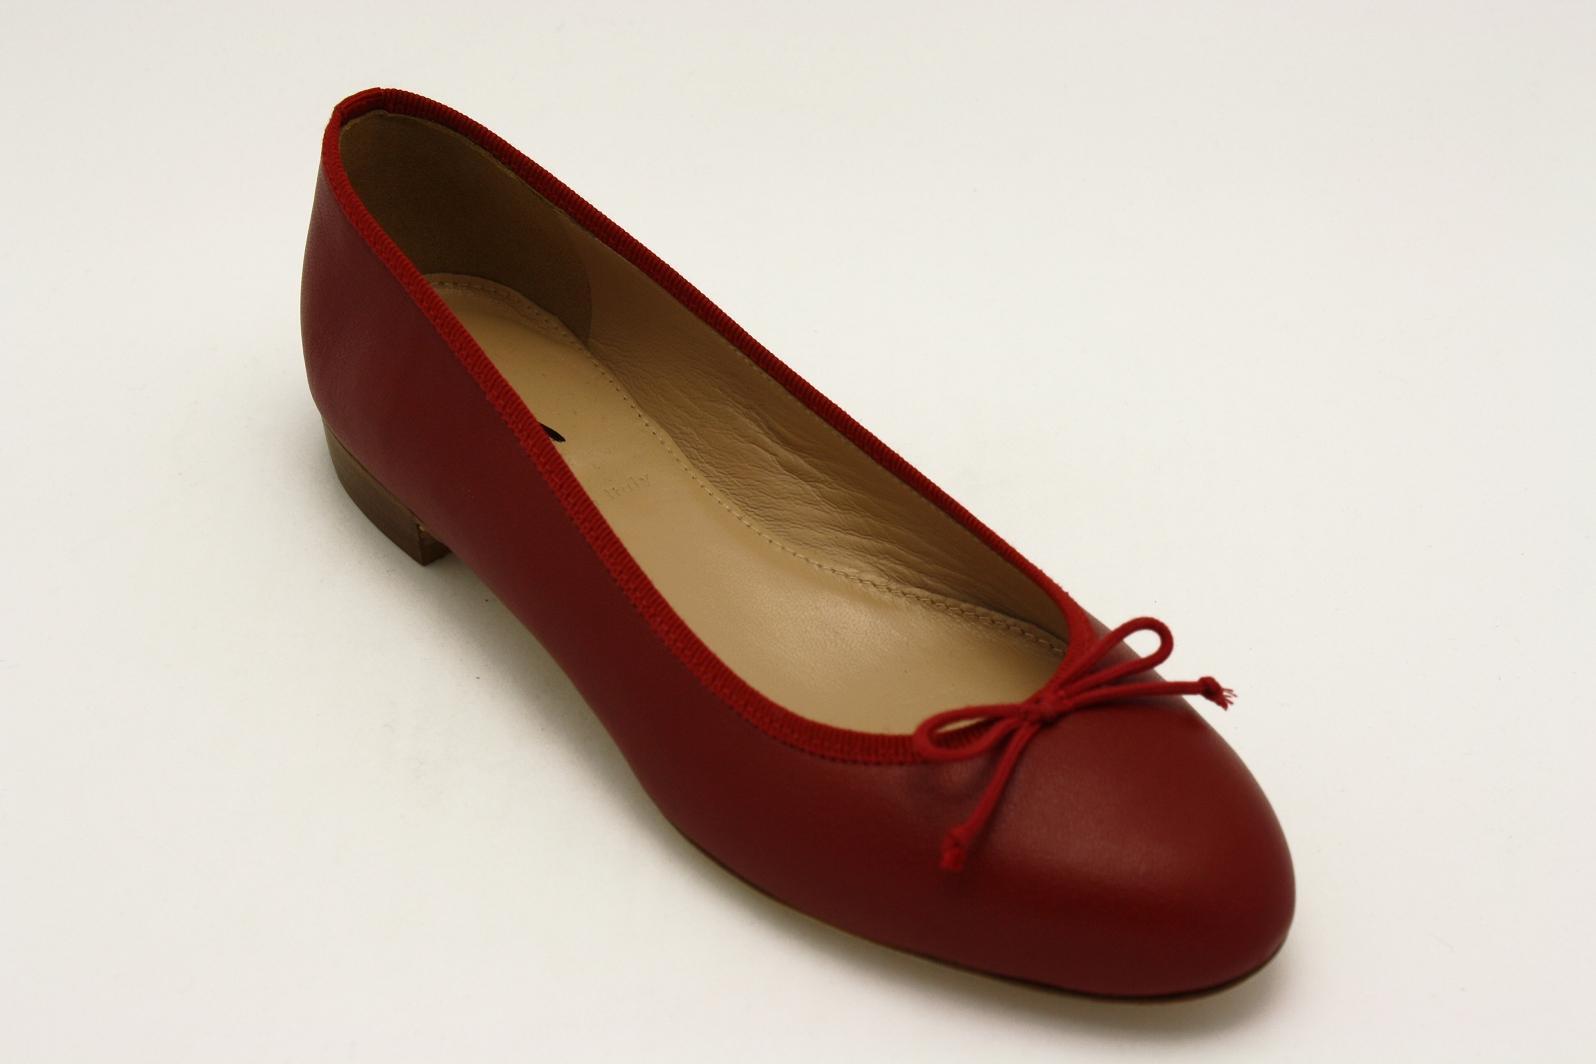 jcrew ballet flats leather shoes 150 moroccan 5 5